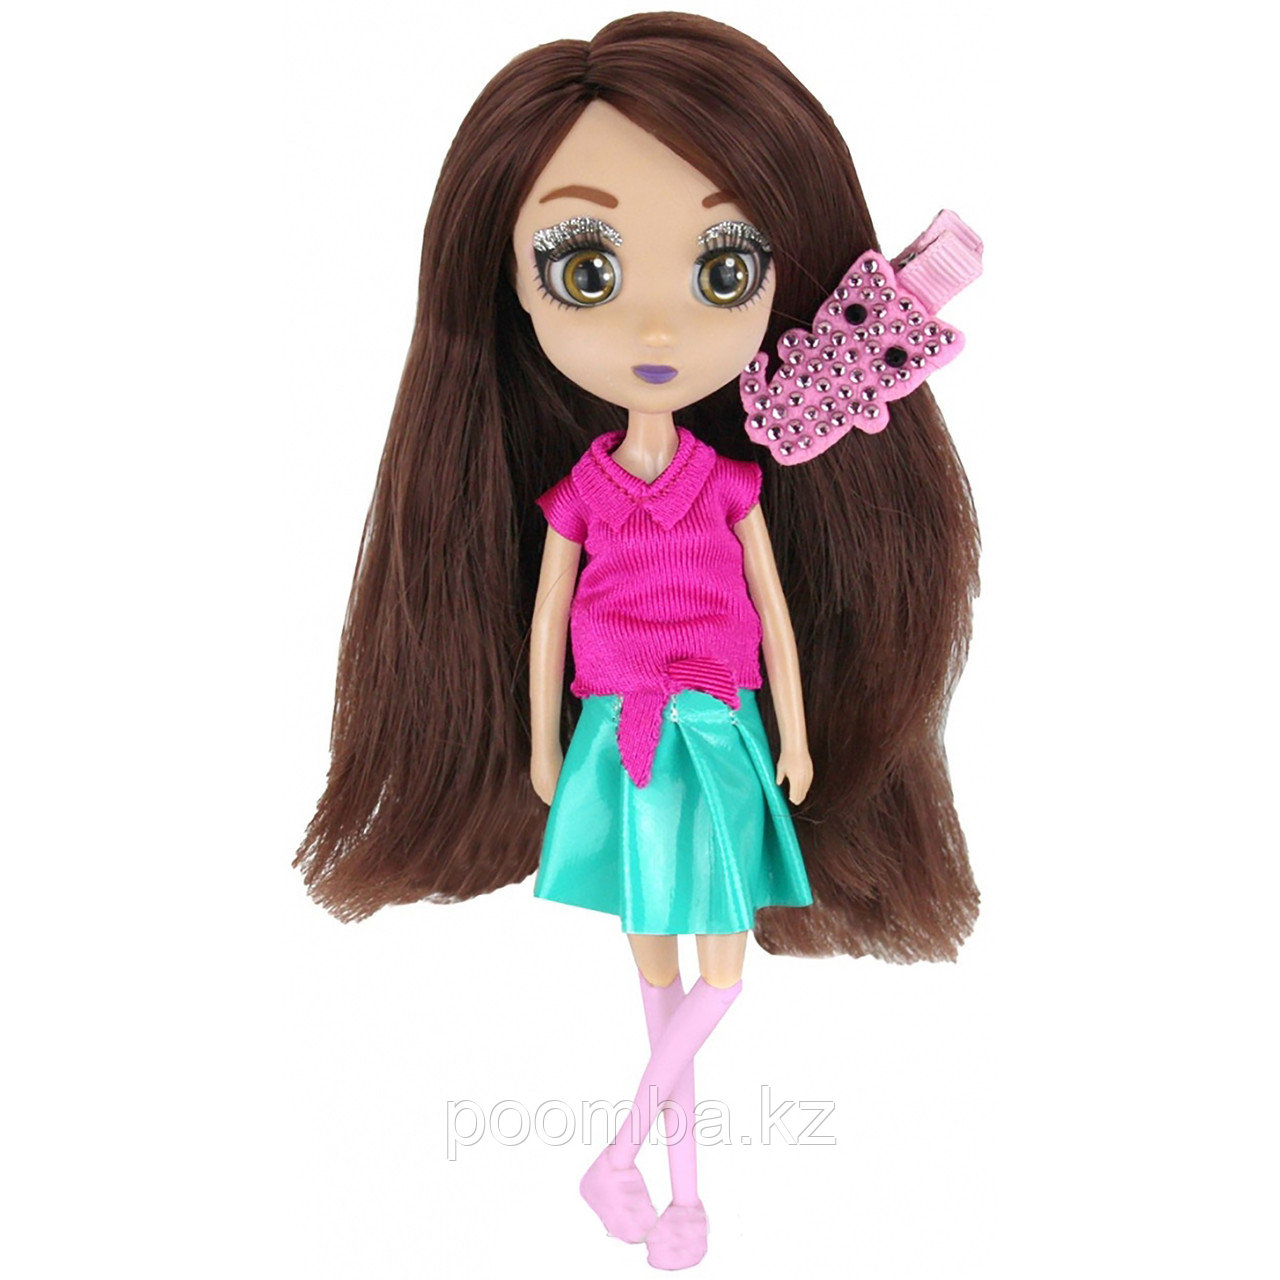 Мини-кукла Shibajuku Girls - Намика,15 см